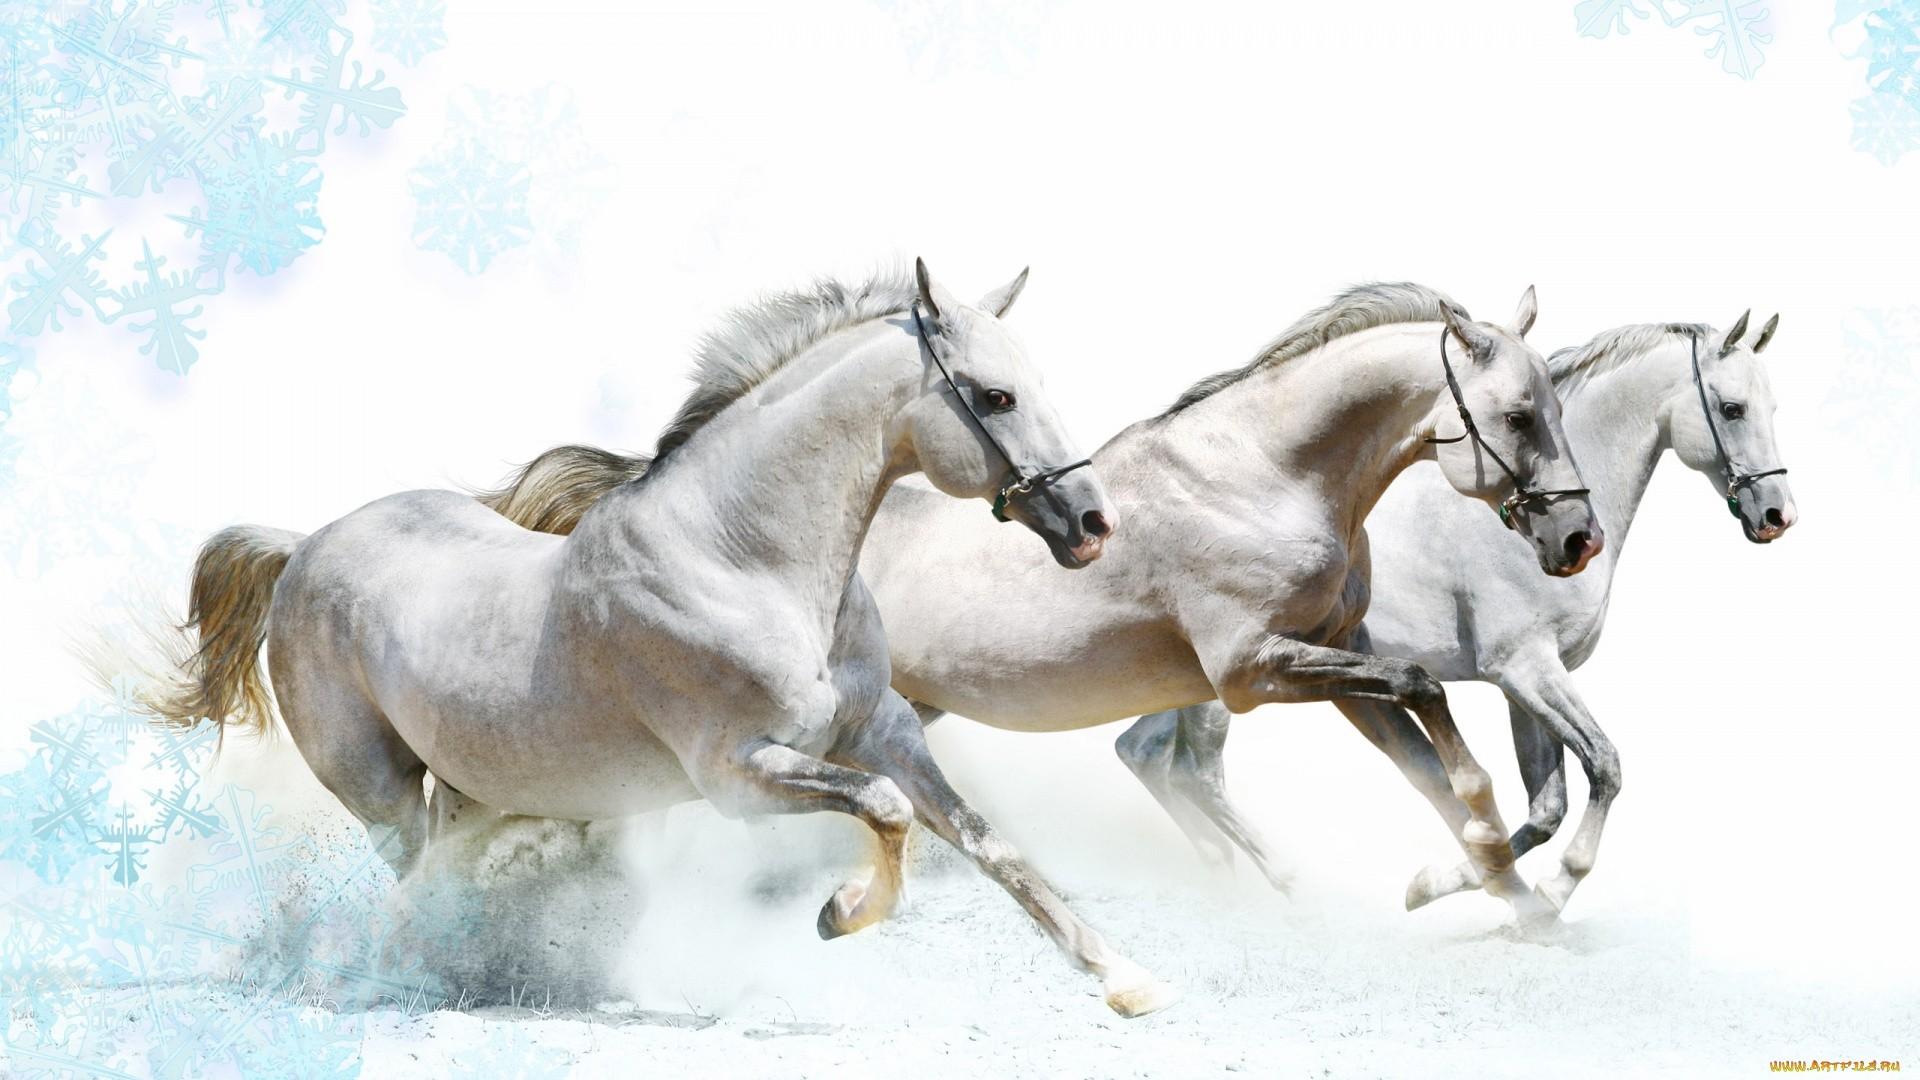 White Horse hd wallpaper download